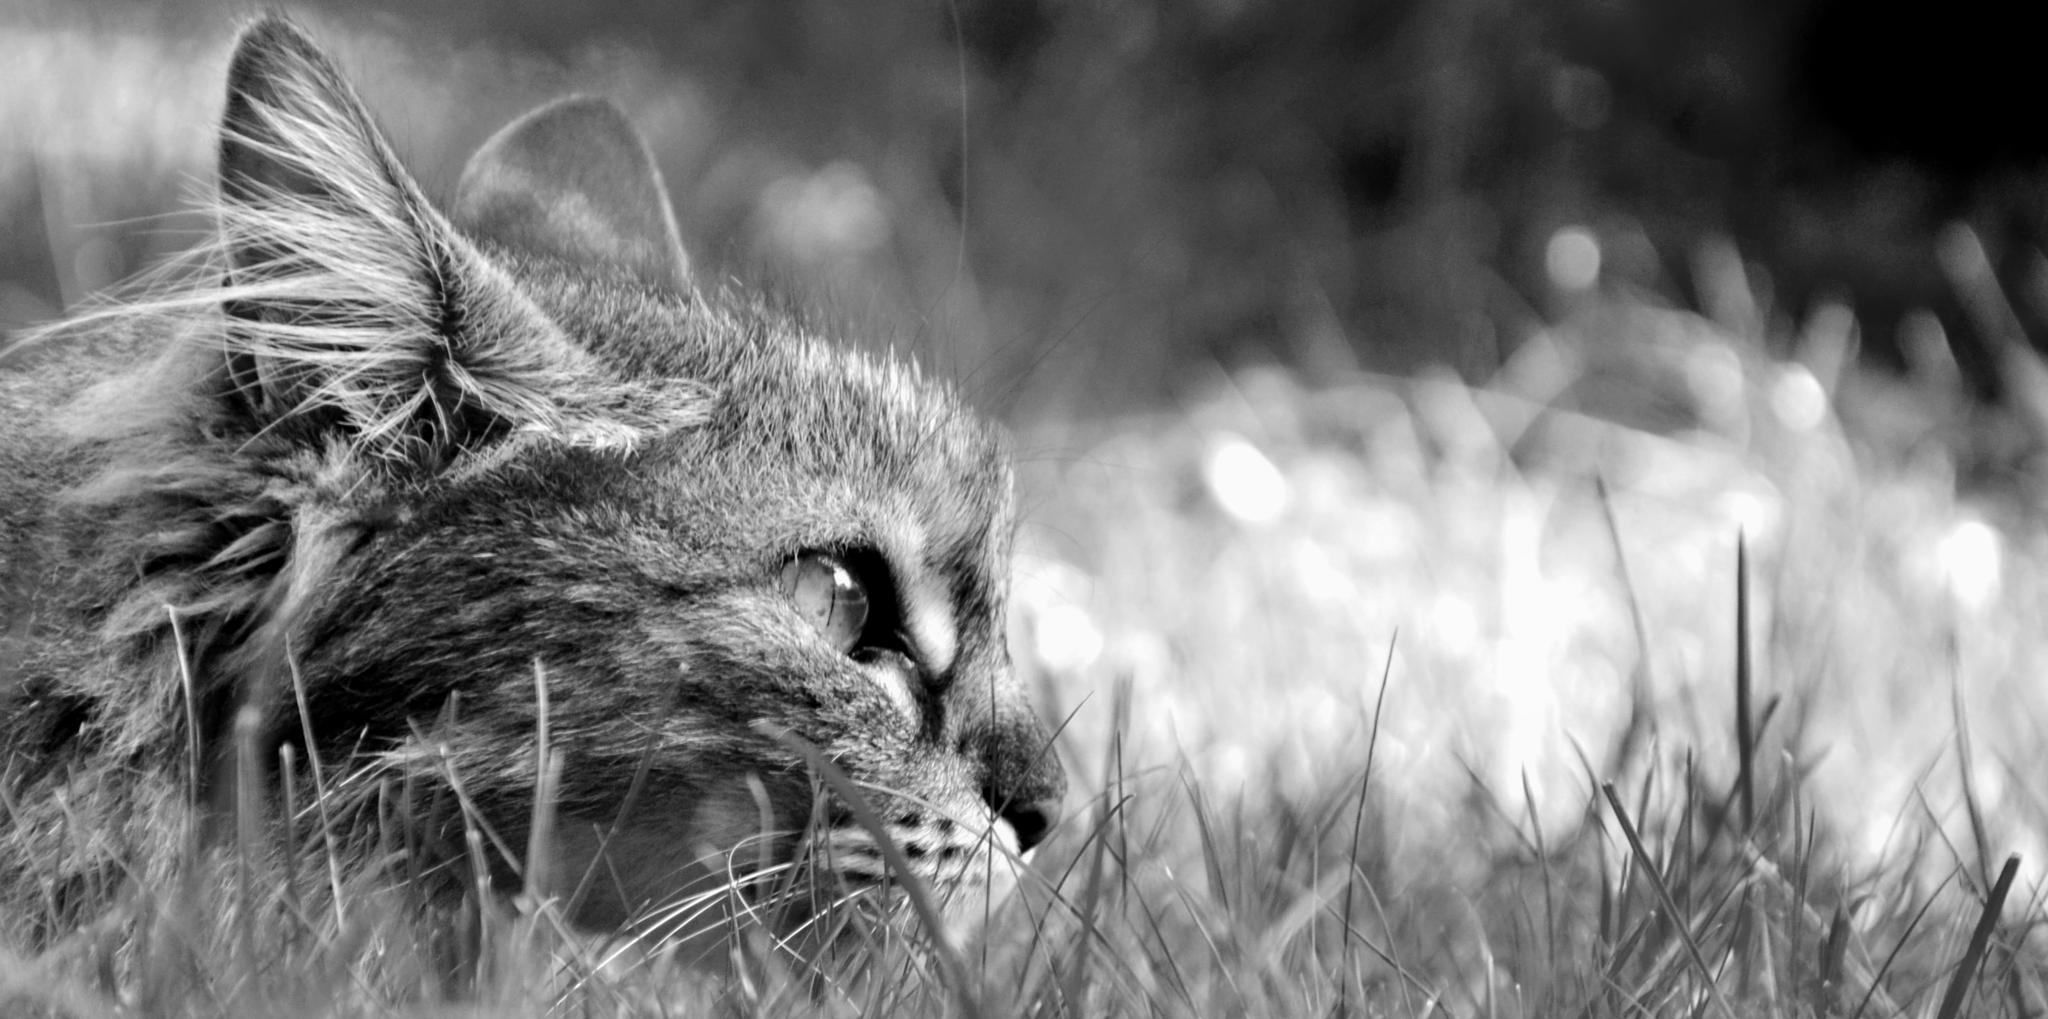 I see you... by Carola Grondona